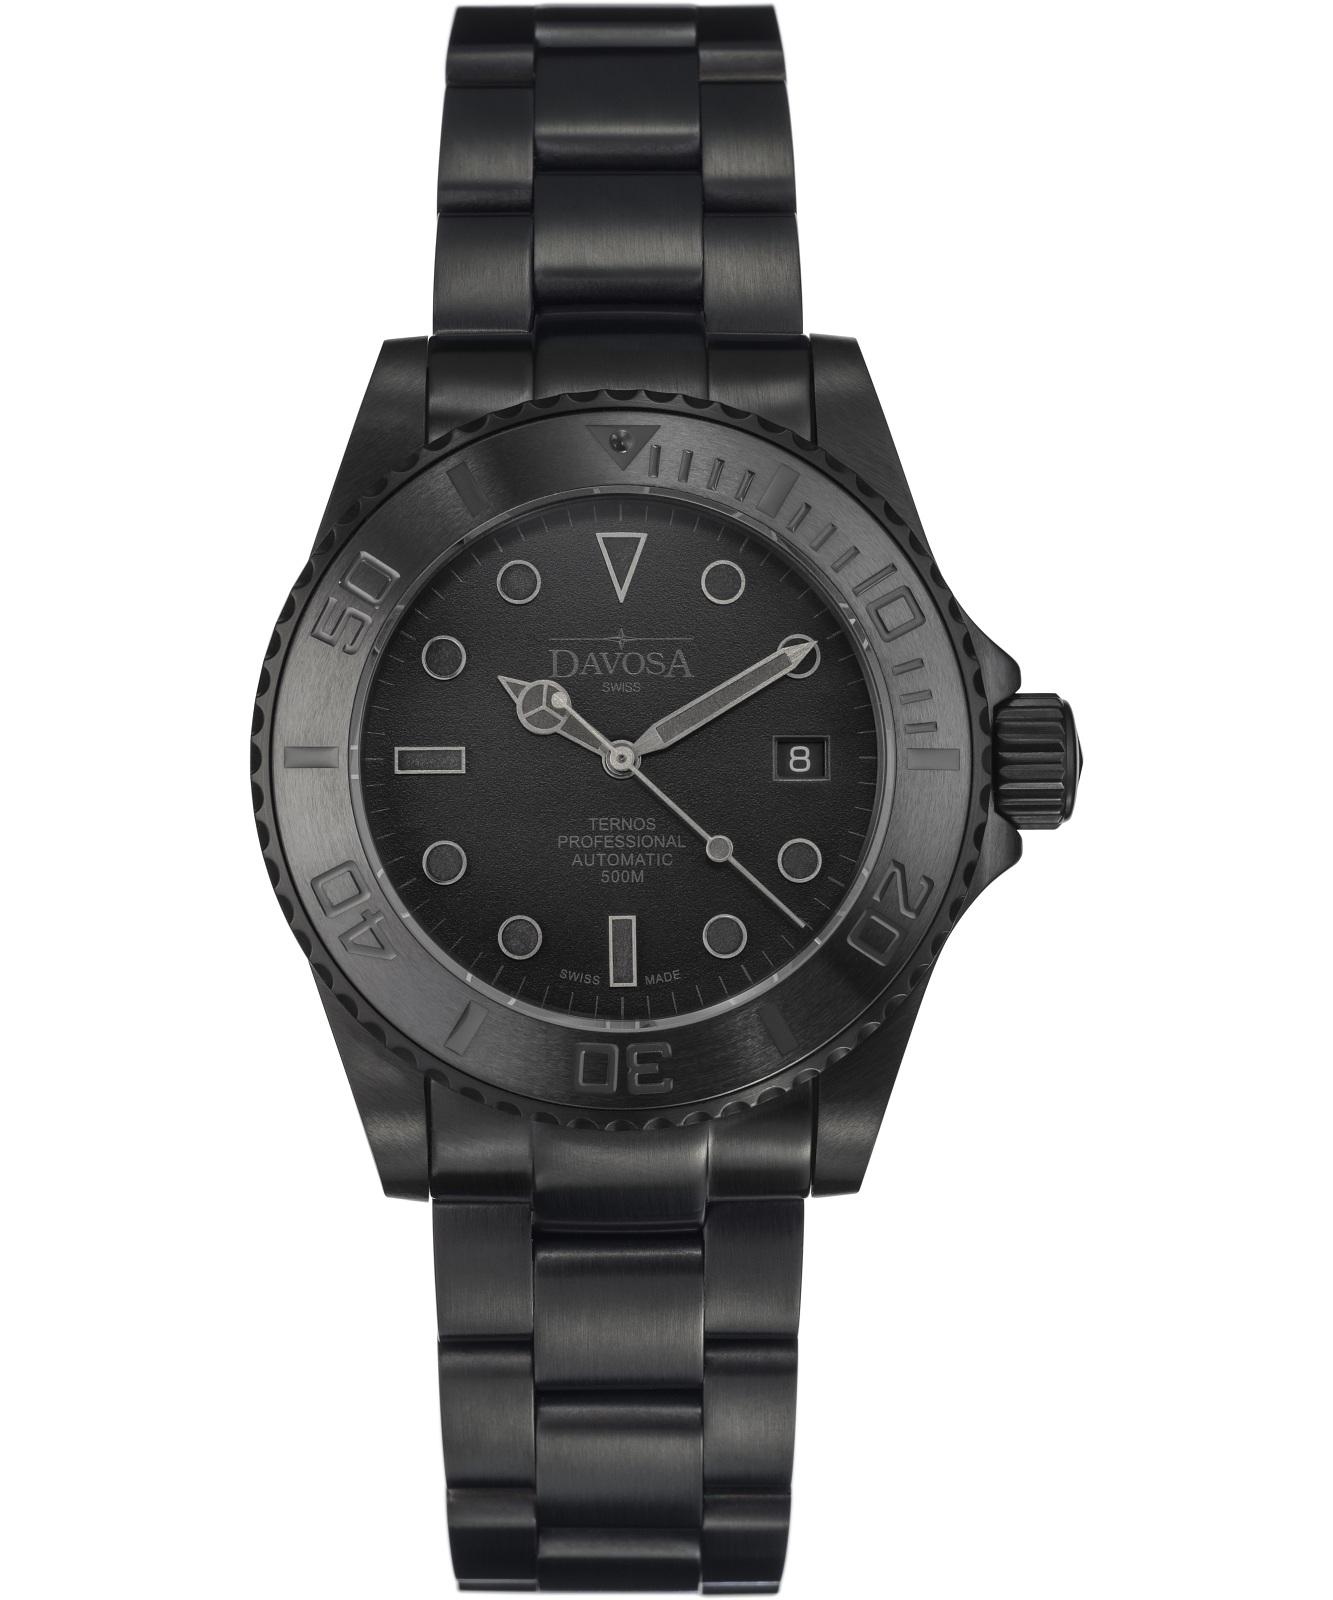 zegarek-meski-davosa-ternos-professional-black-suit-automatic-161-583-50